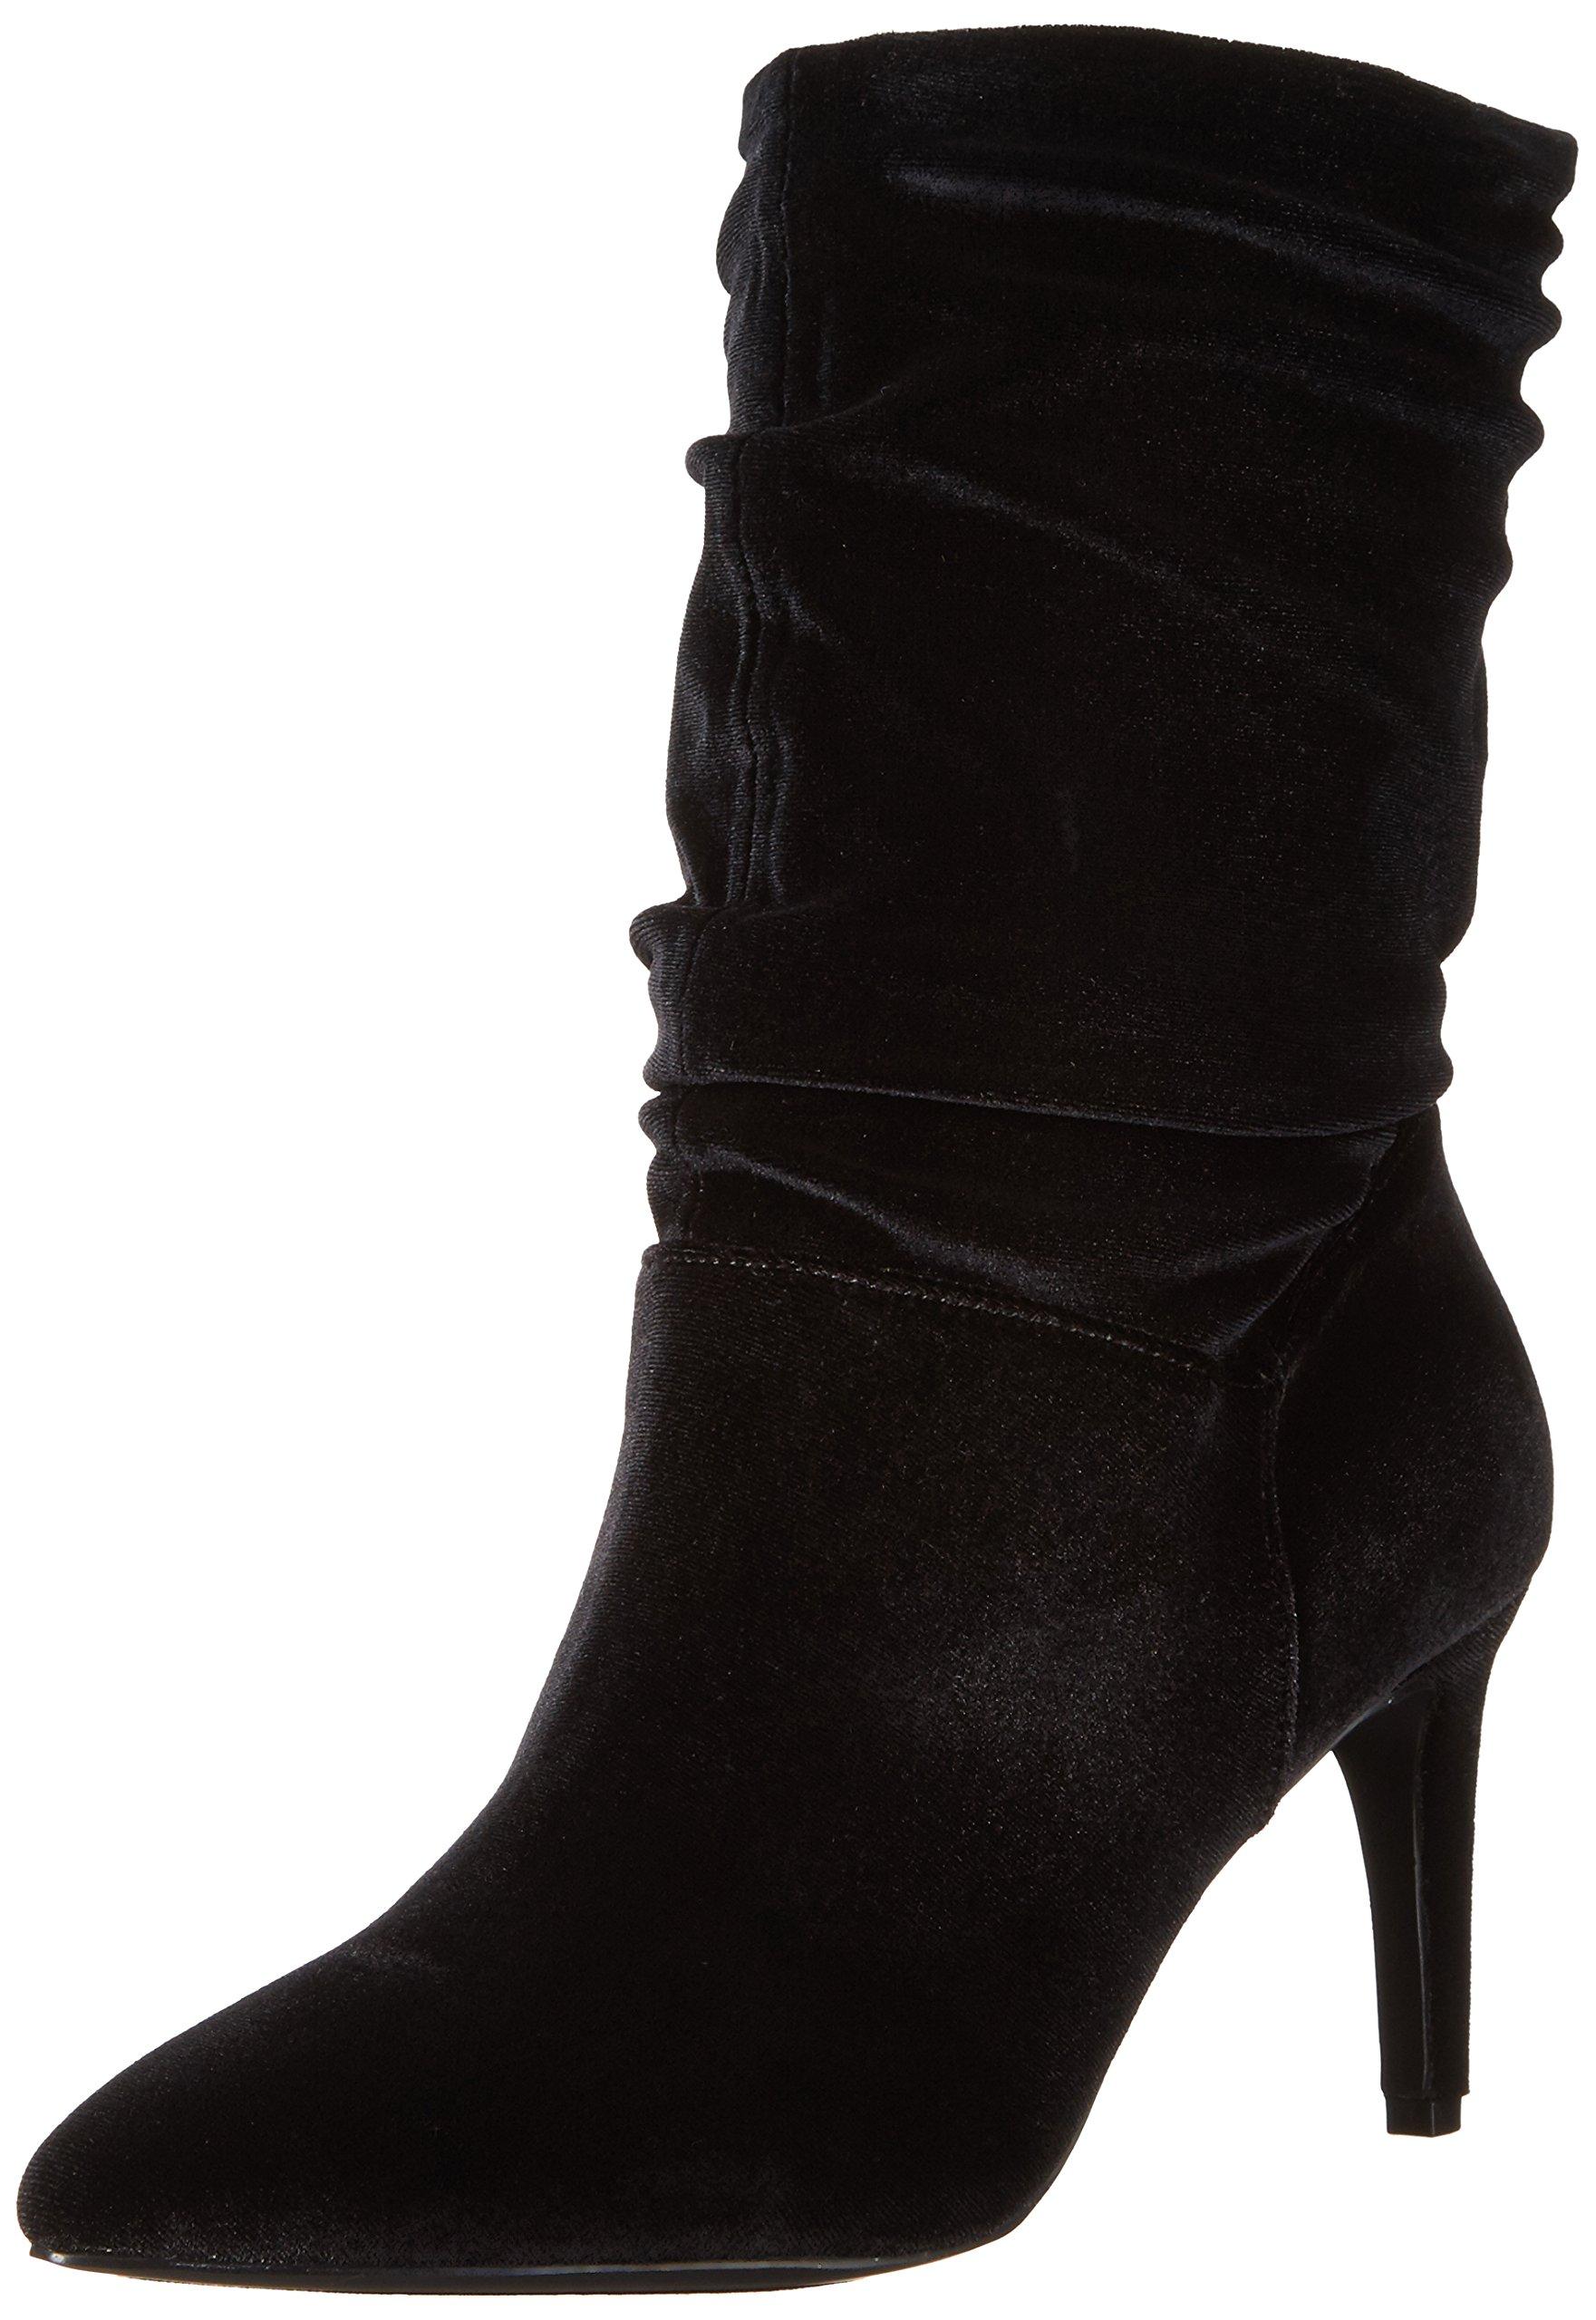 Style by Charles David Women's Lenny Fashion Boot, Black, 9.5 Medium US